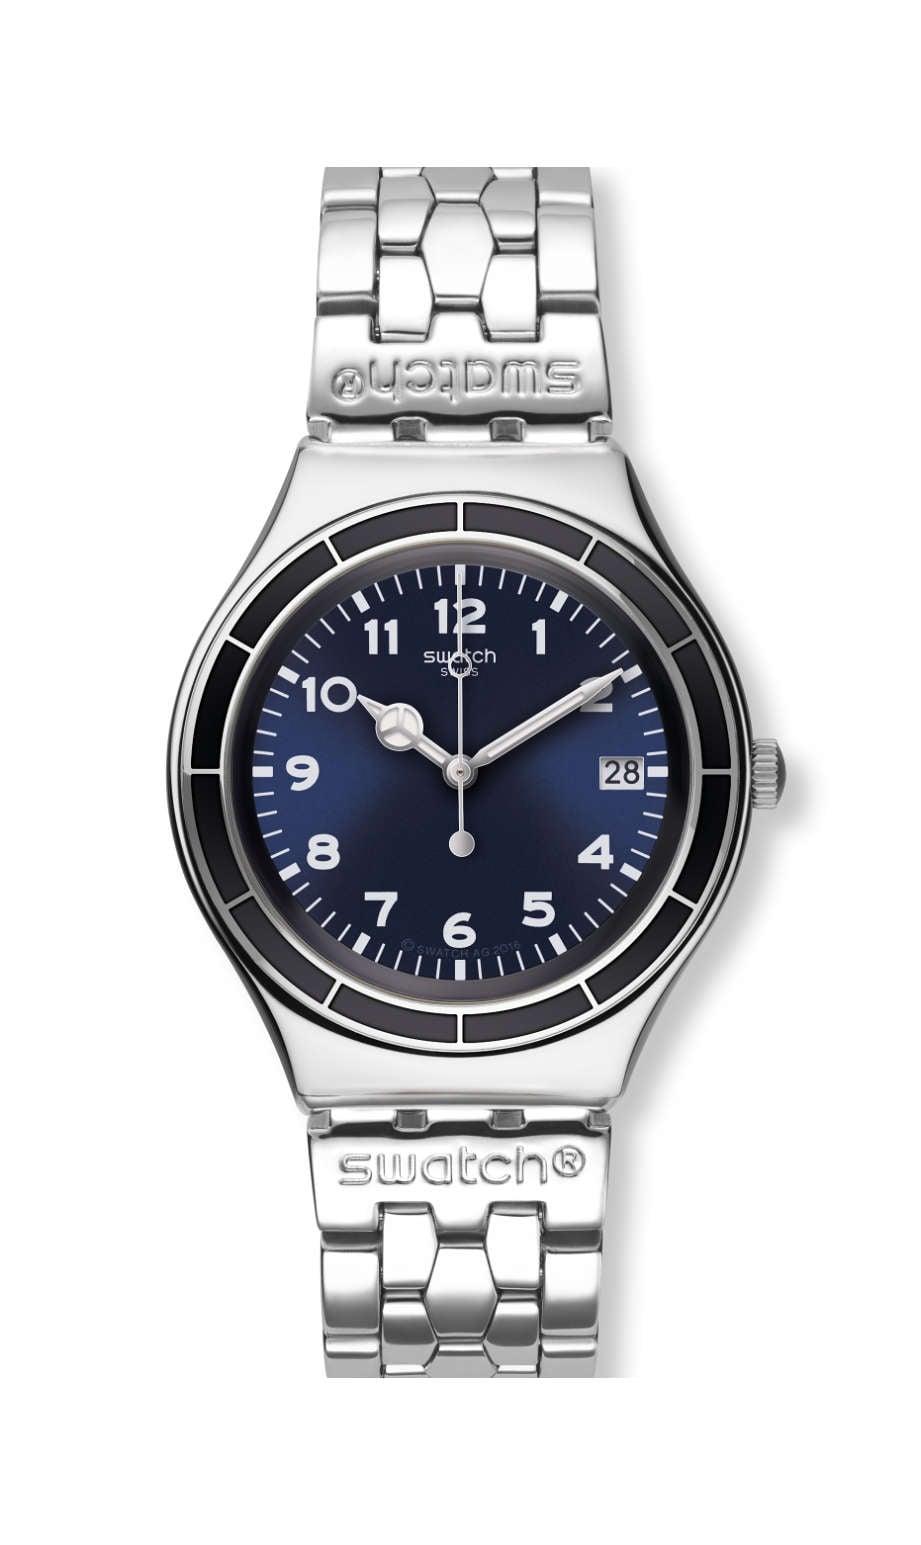 Swatch - EDGAR - 1